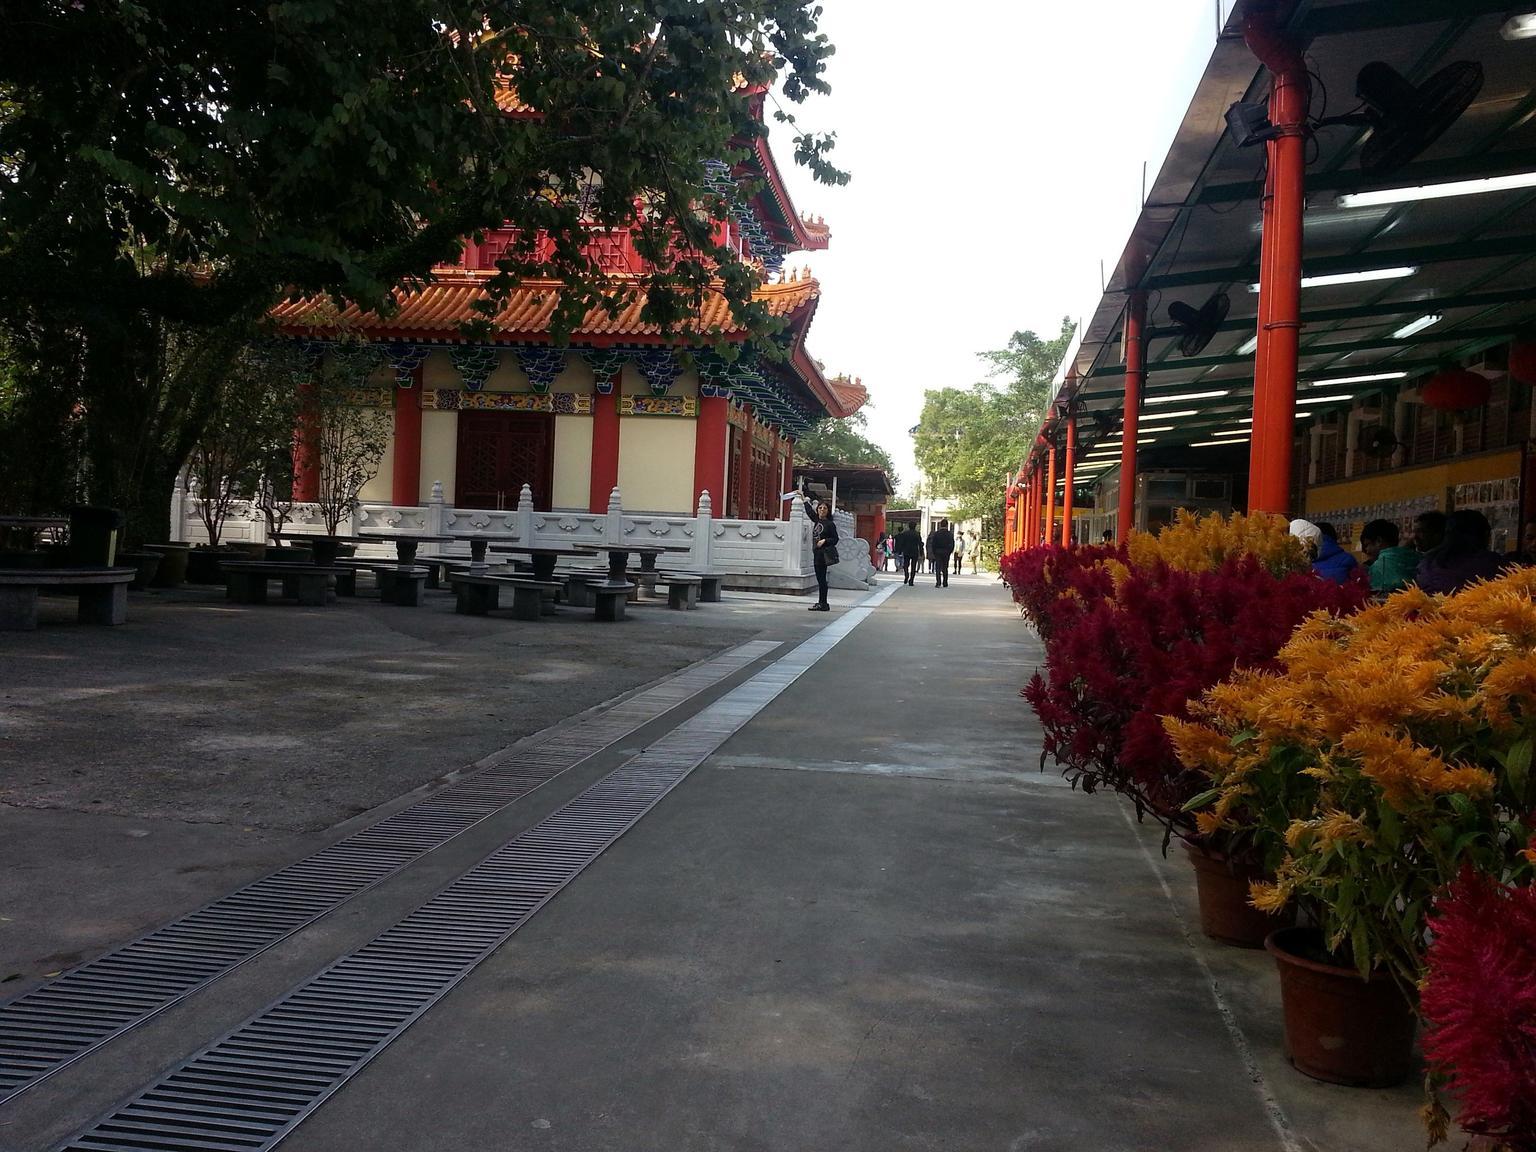 MÁS FOTOS, Full-Day Private Tour of Lantau Island including Big Buddha and Tai O